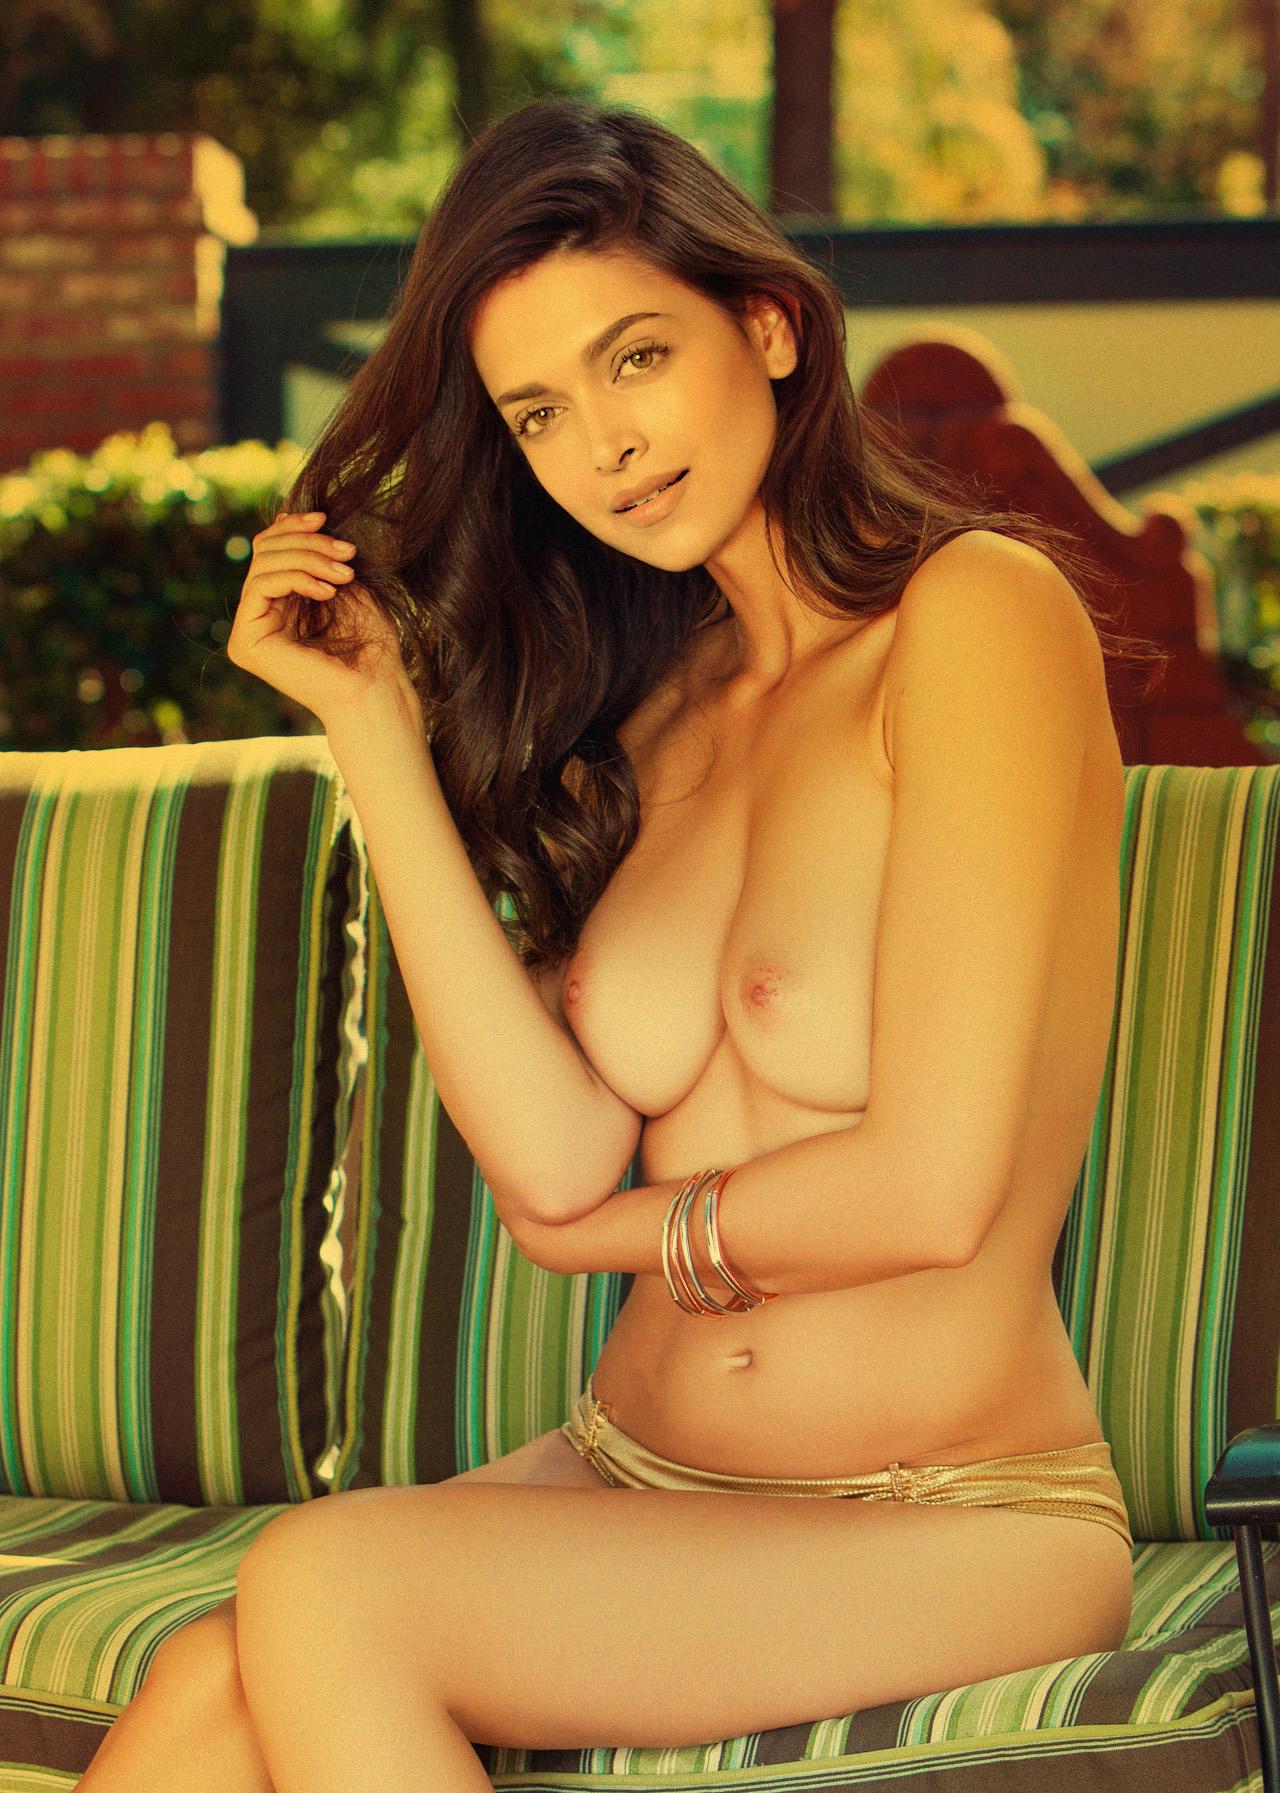 Nude Image Dipika Hotels Krameramtssgaleryn